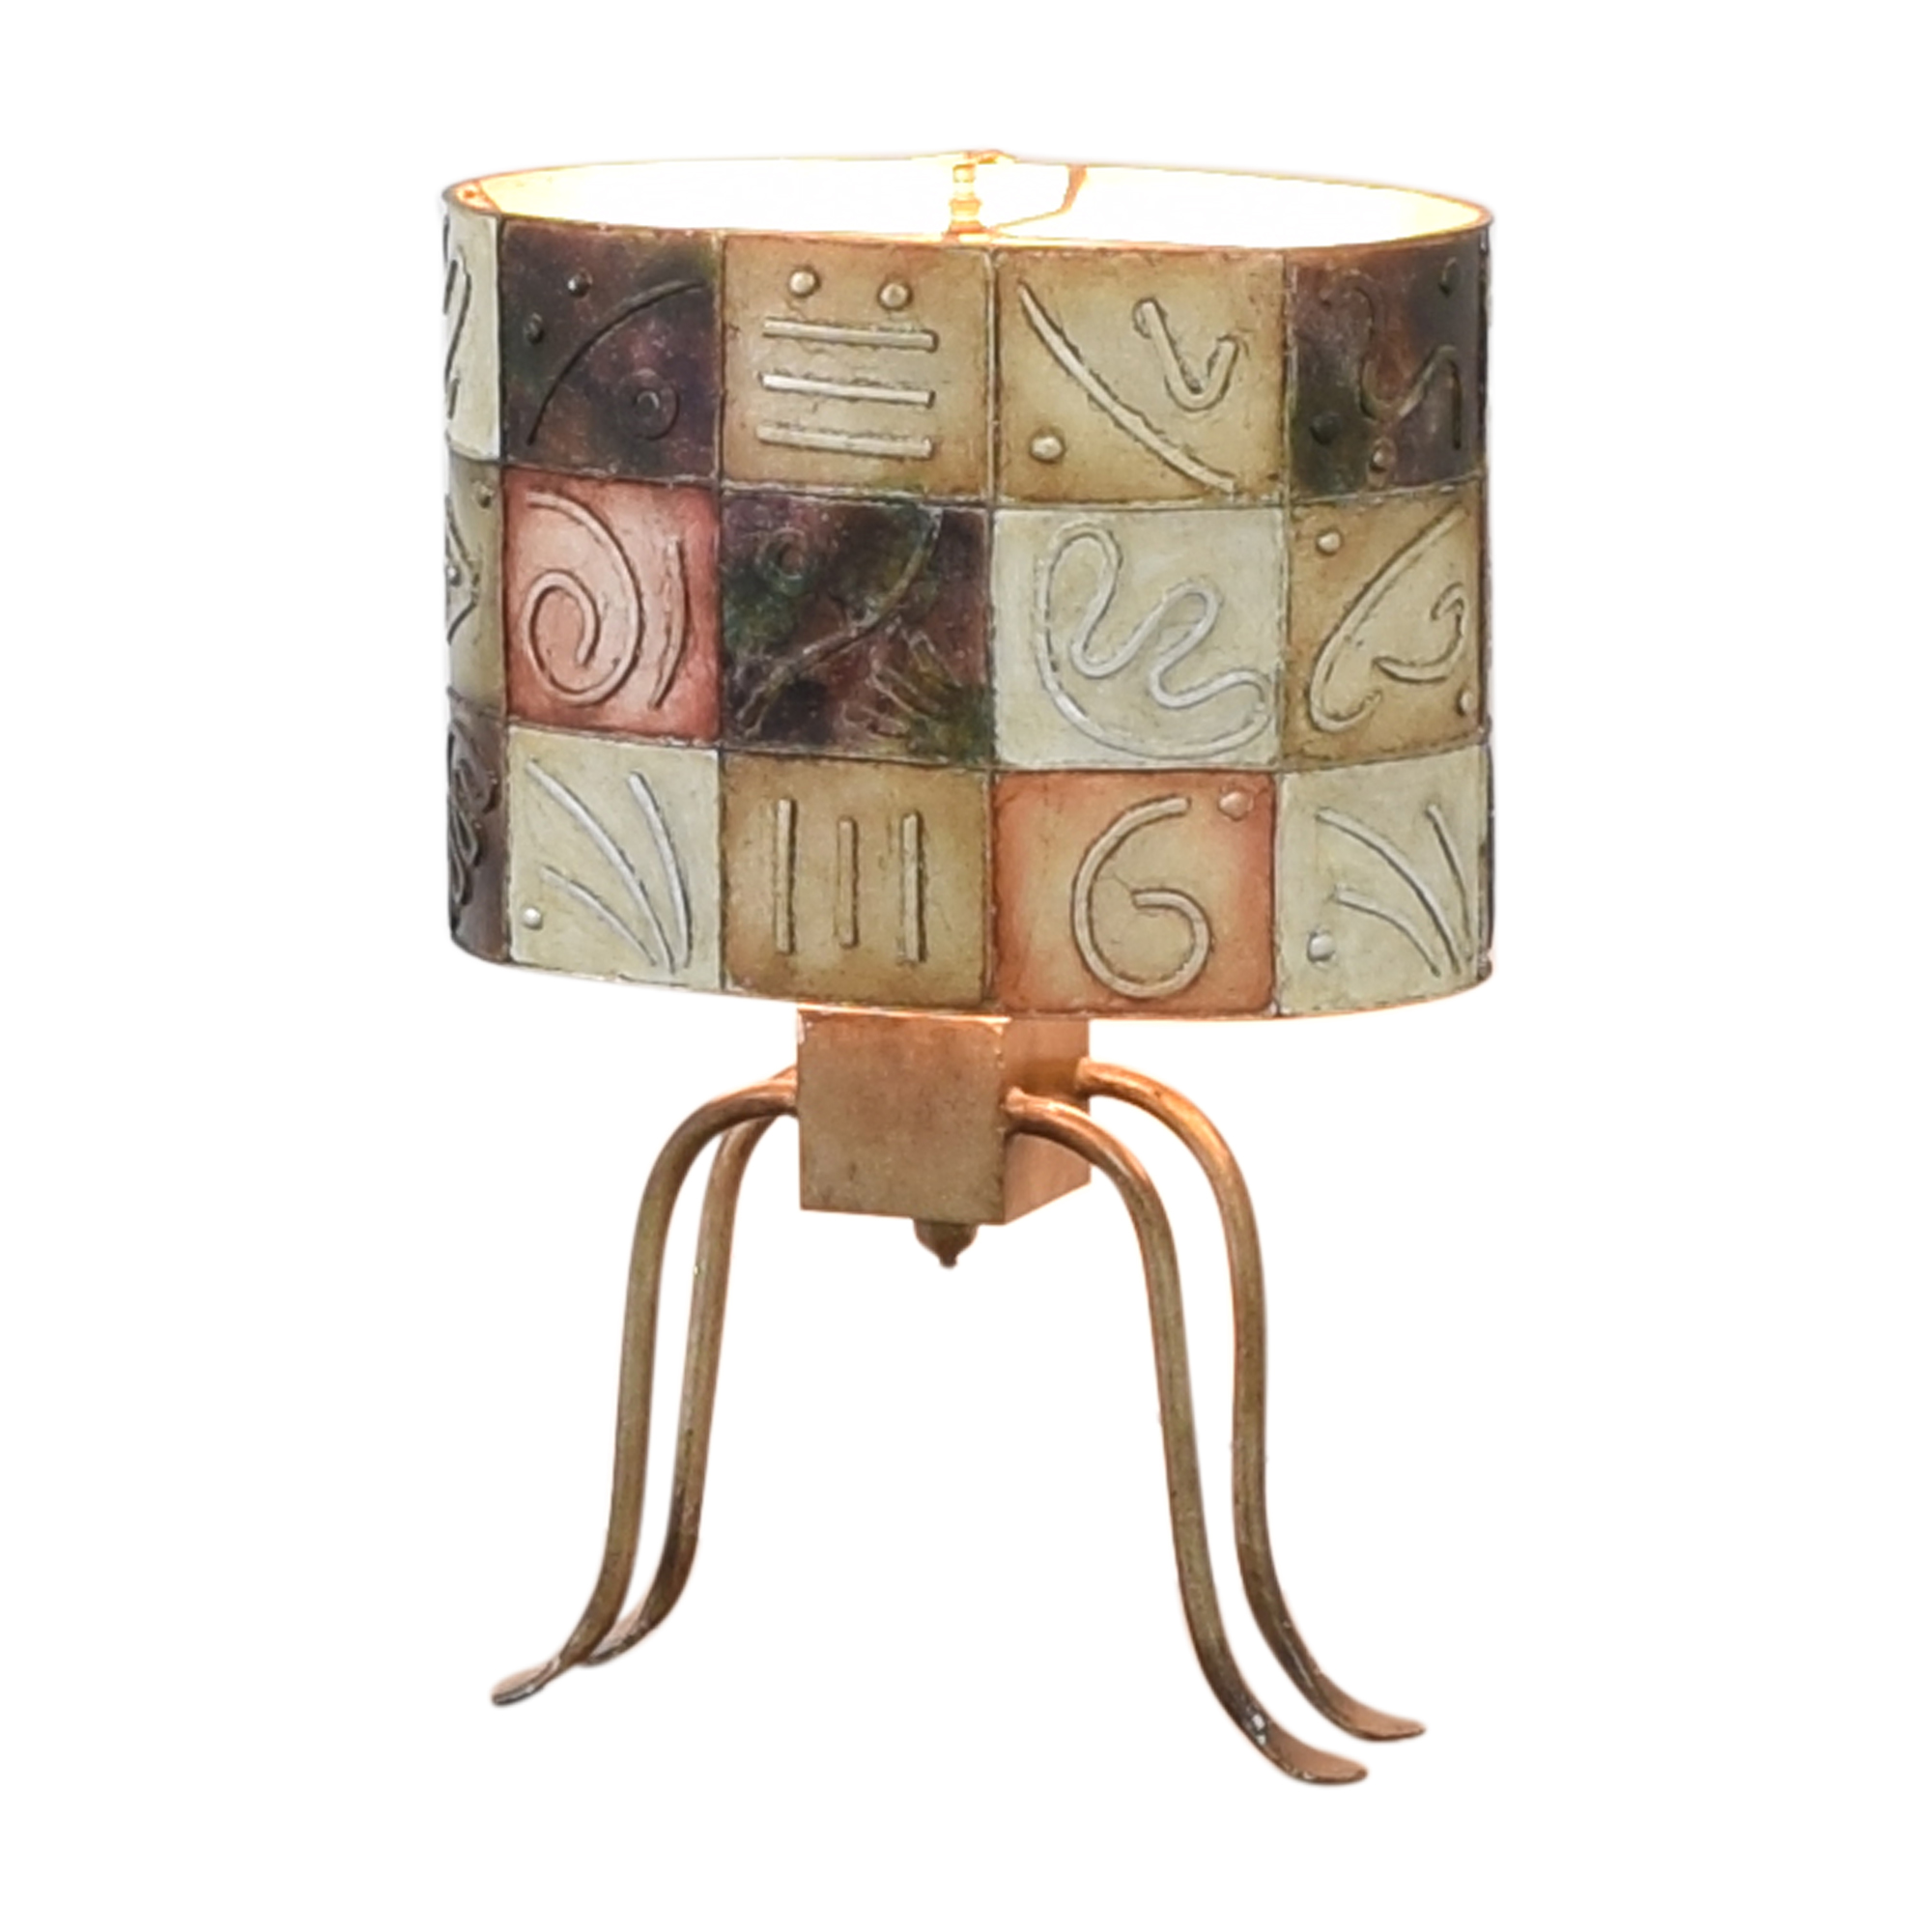 Decorative Table Lamp dimensions